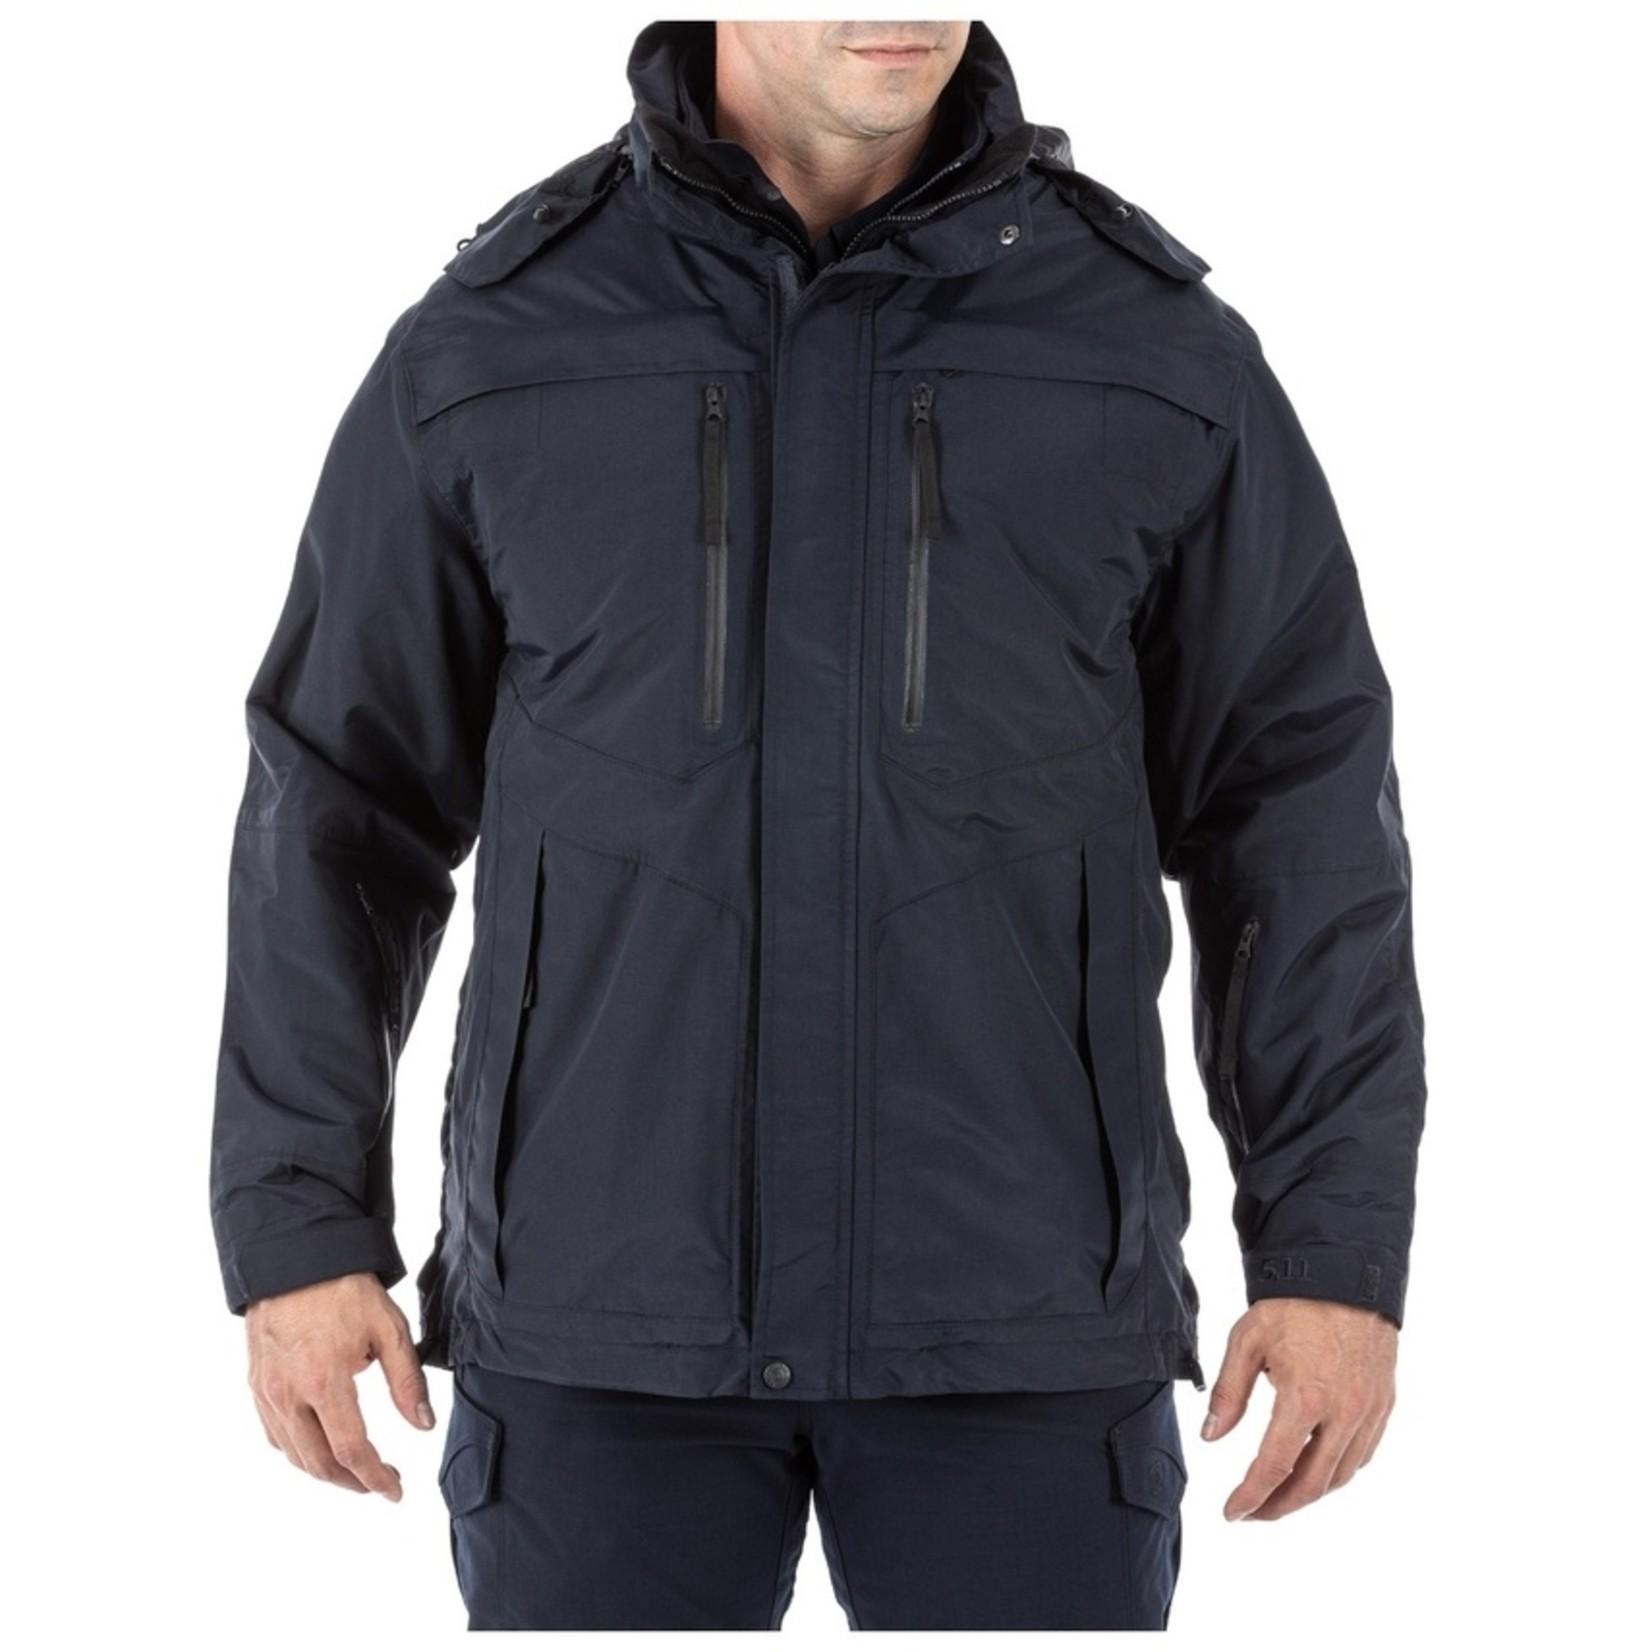 5.11 Tactical 5.11 Men's Bristol Parka- Size: Large